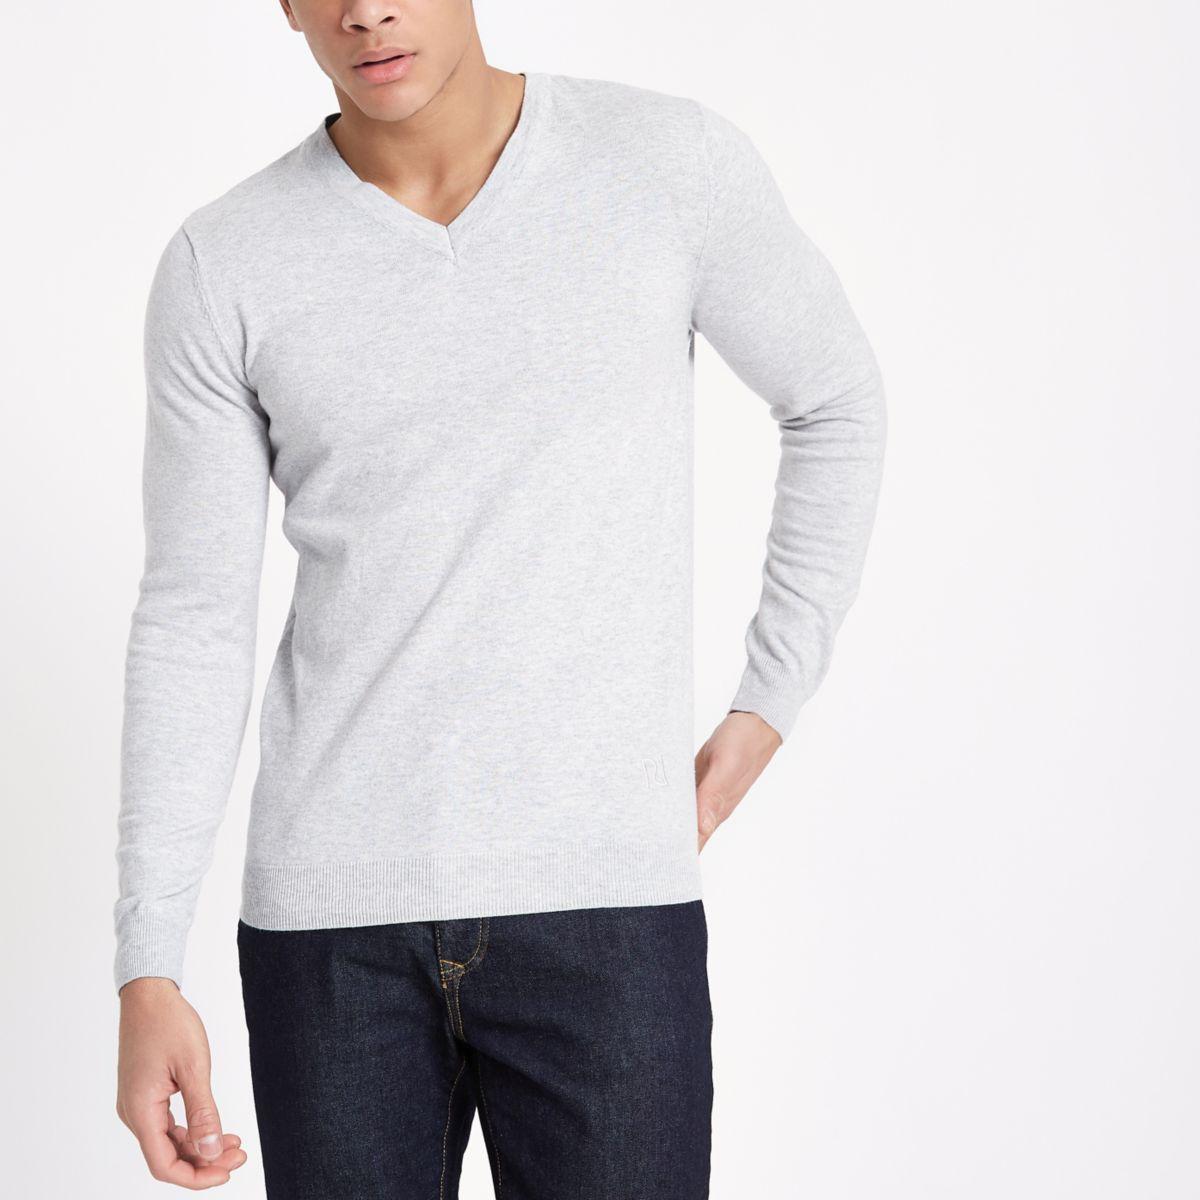 Grey V neck slim fit sweater